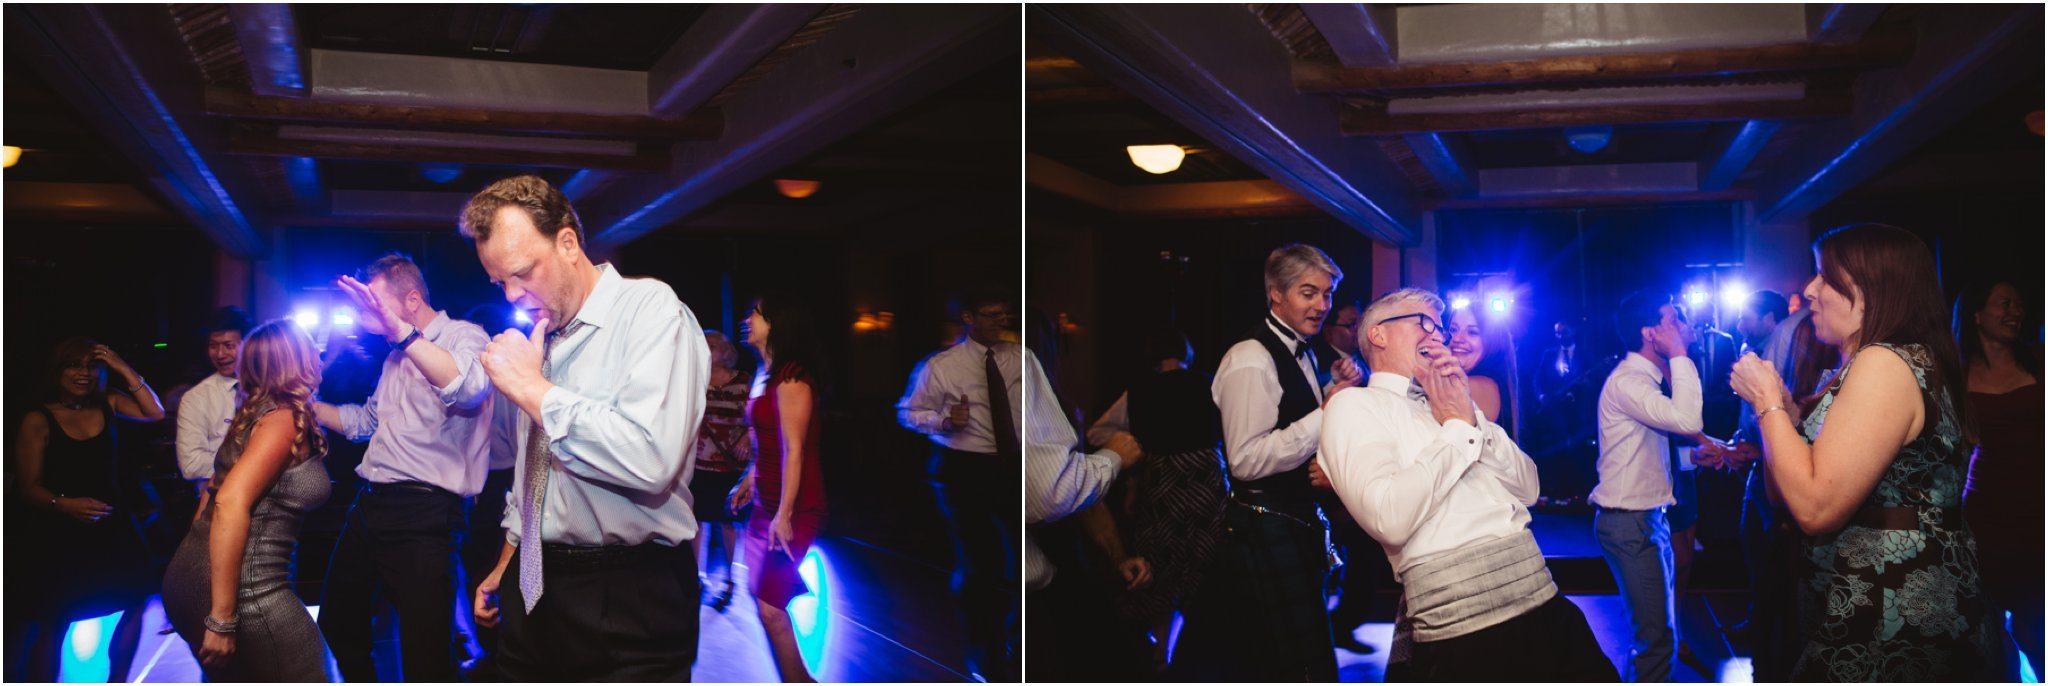 0045new-mexico-same-sex-wedding_santa-fe-wedding-photographer_albuquerque-wedding-photographer_top-photographer_-southwest-wedding-photography_-blue-rose-studio